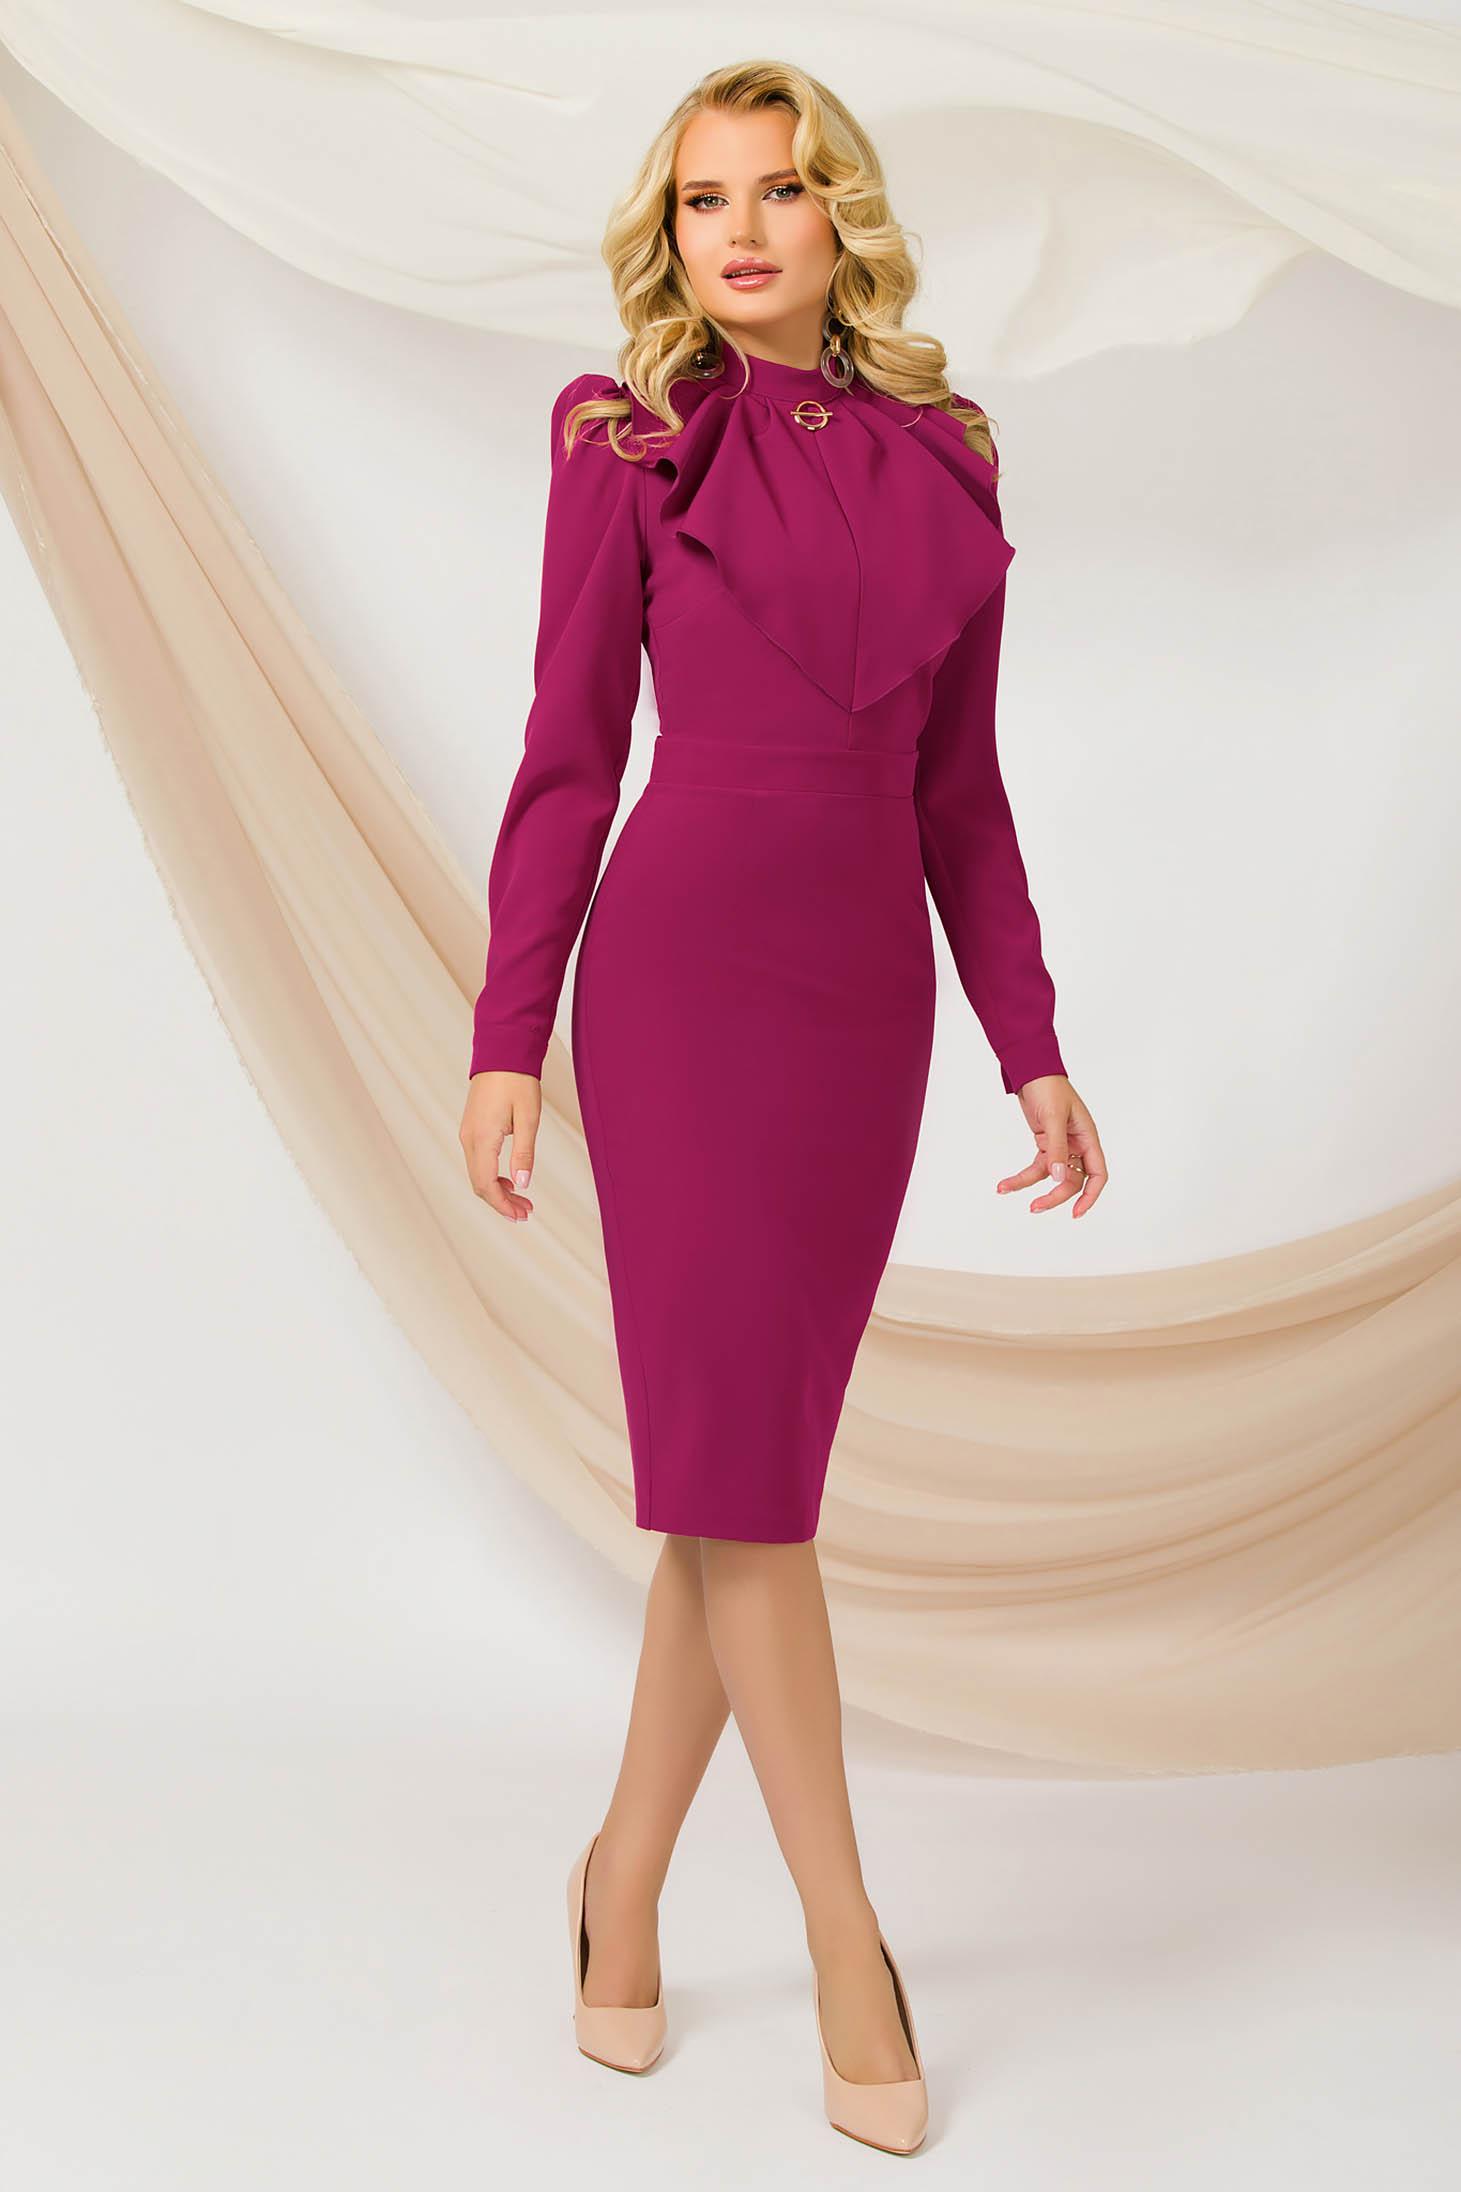 Raspberry dress midi pencil thin fabric office slightly elastic fabric accessorized with breastpin